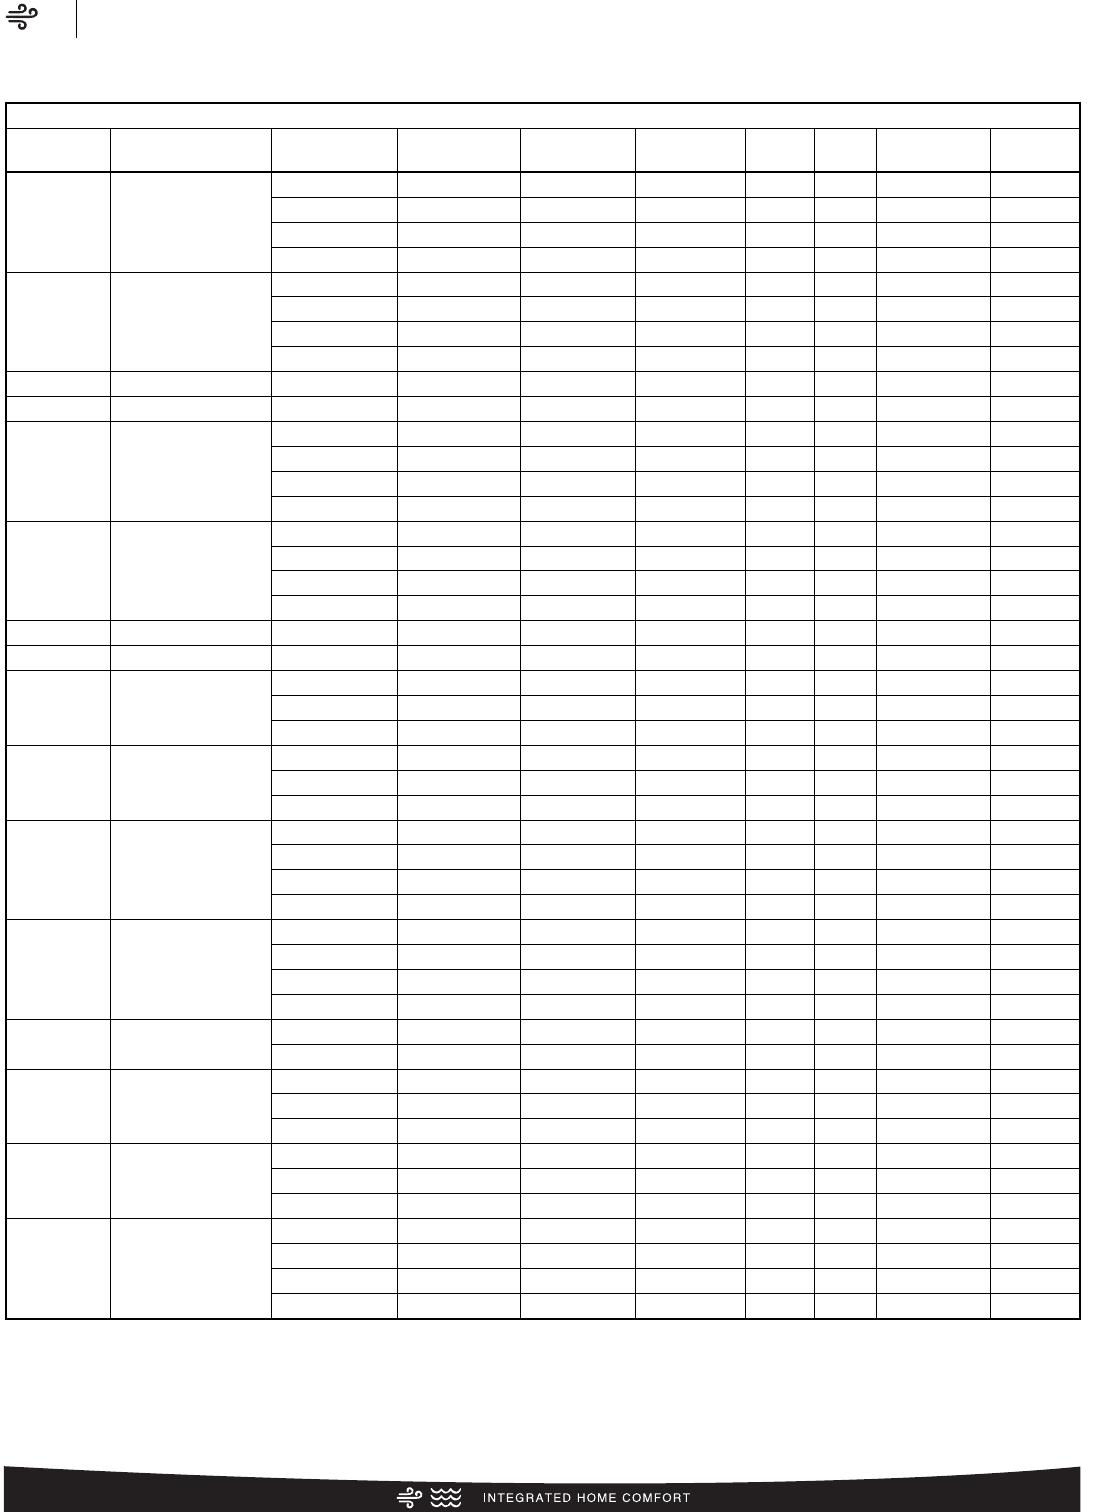 rheem rhll wiring diagram rheem classic series single stage ra13 specification sheet  ra13 specification sheet